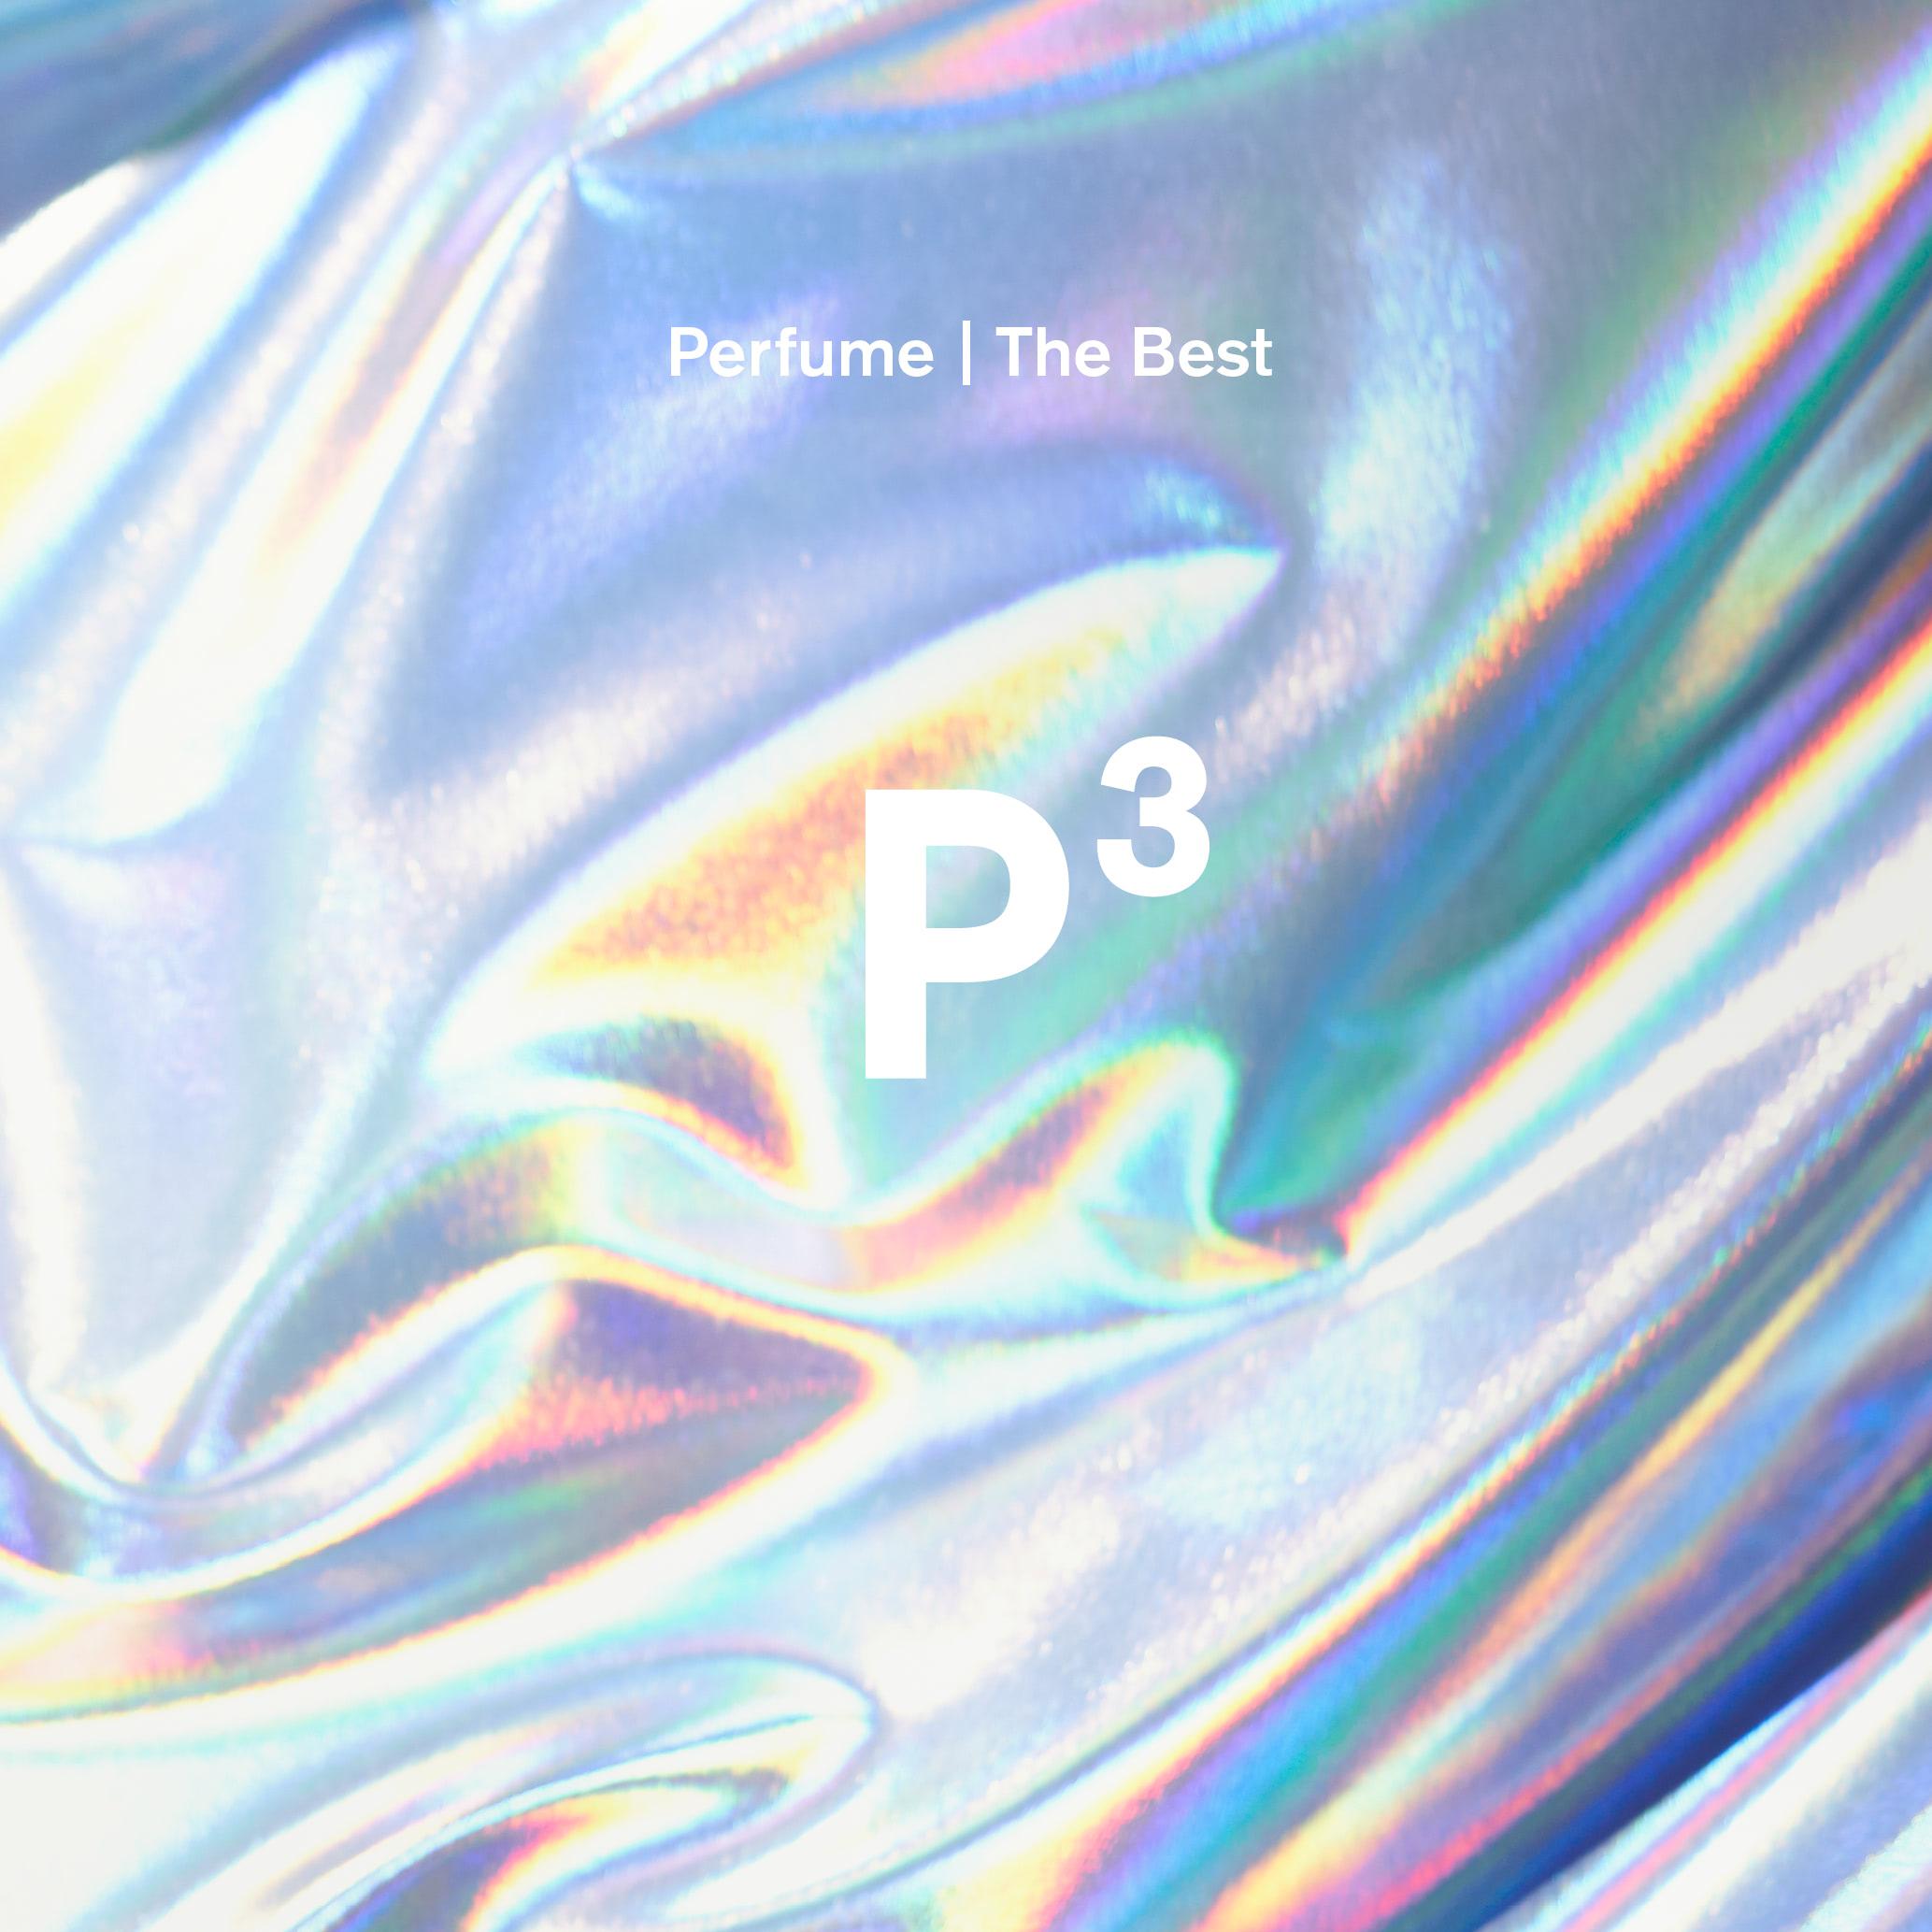 Perfume 『Perfume The Best